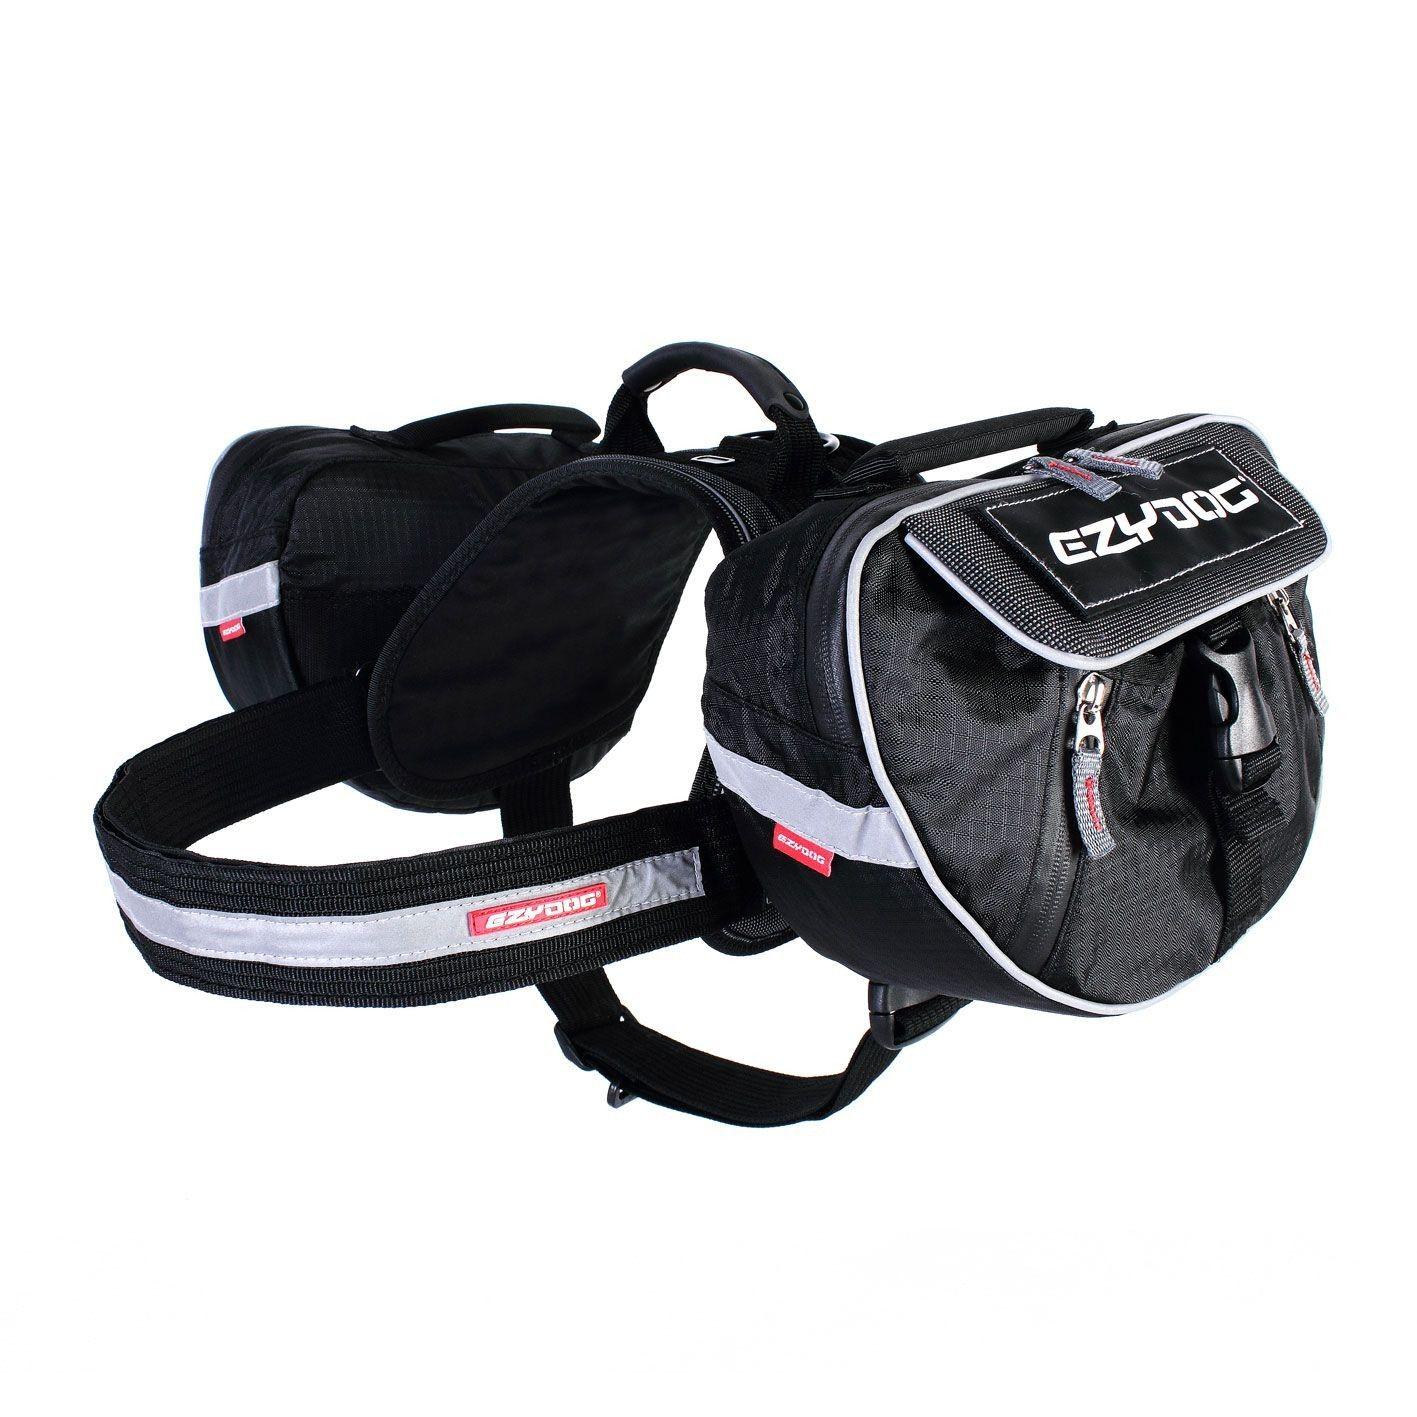 Convert Saddle Bags